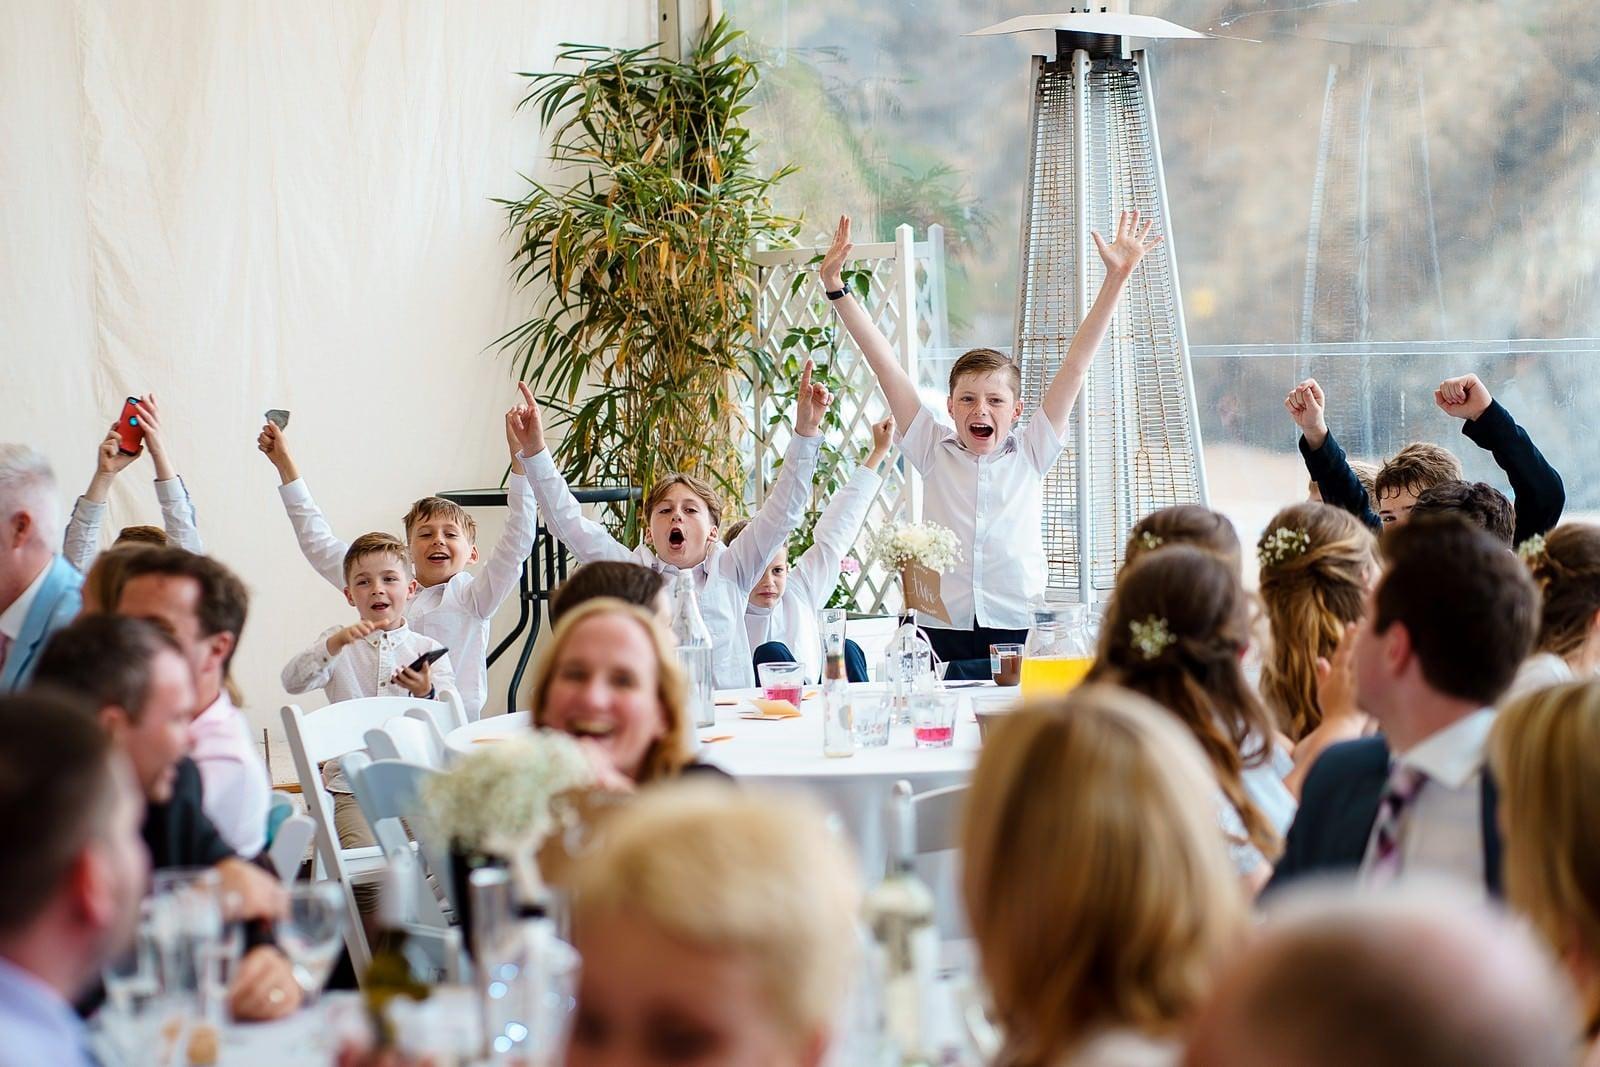 paige boys at a lusty glaze wedding in nequay